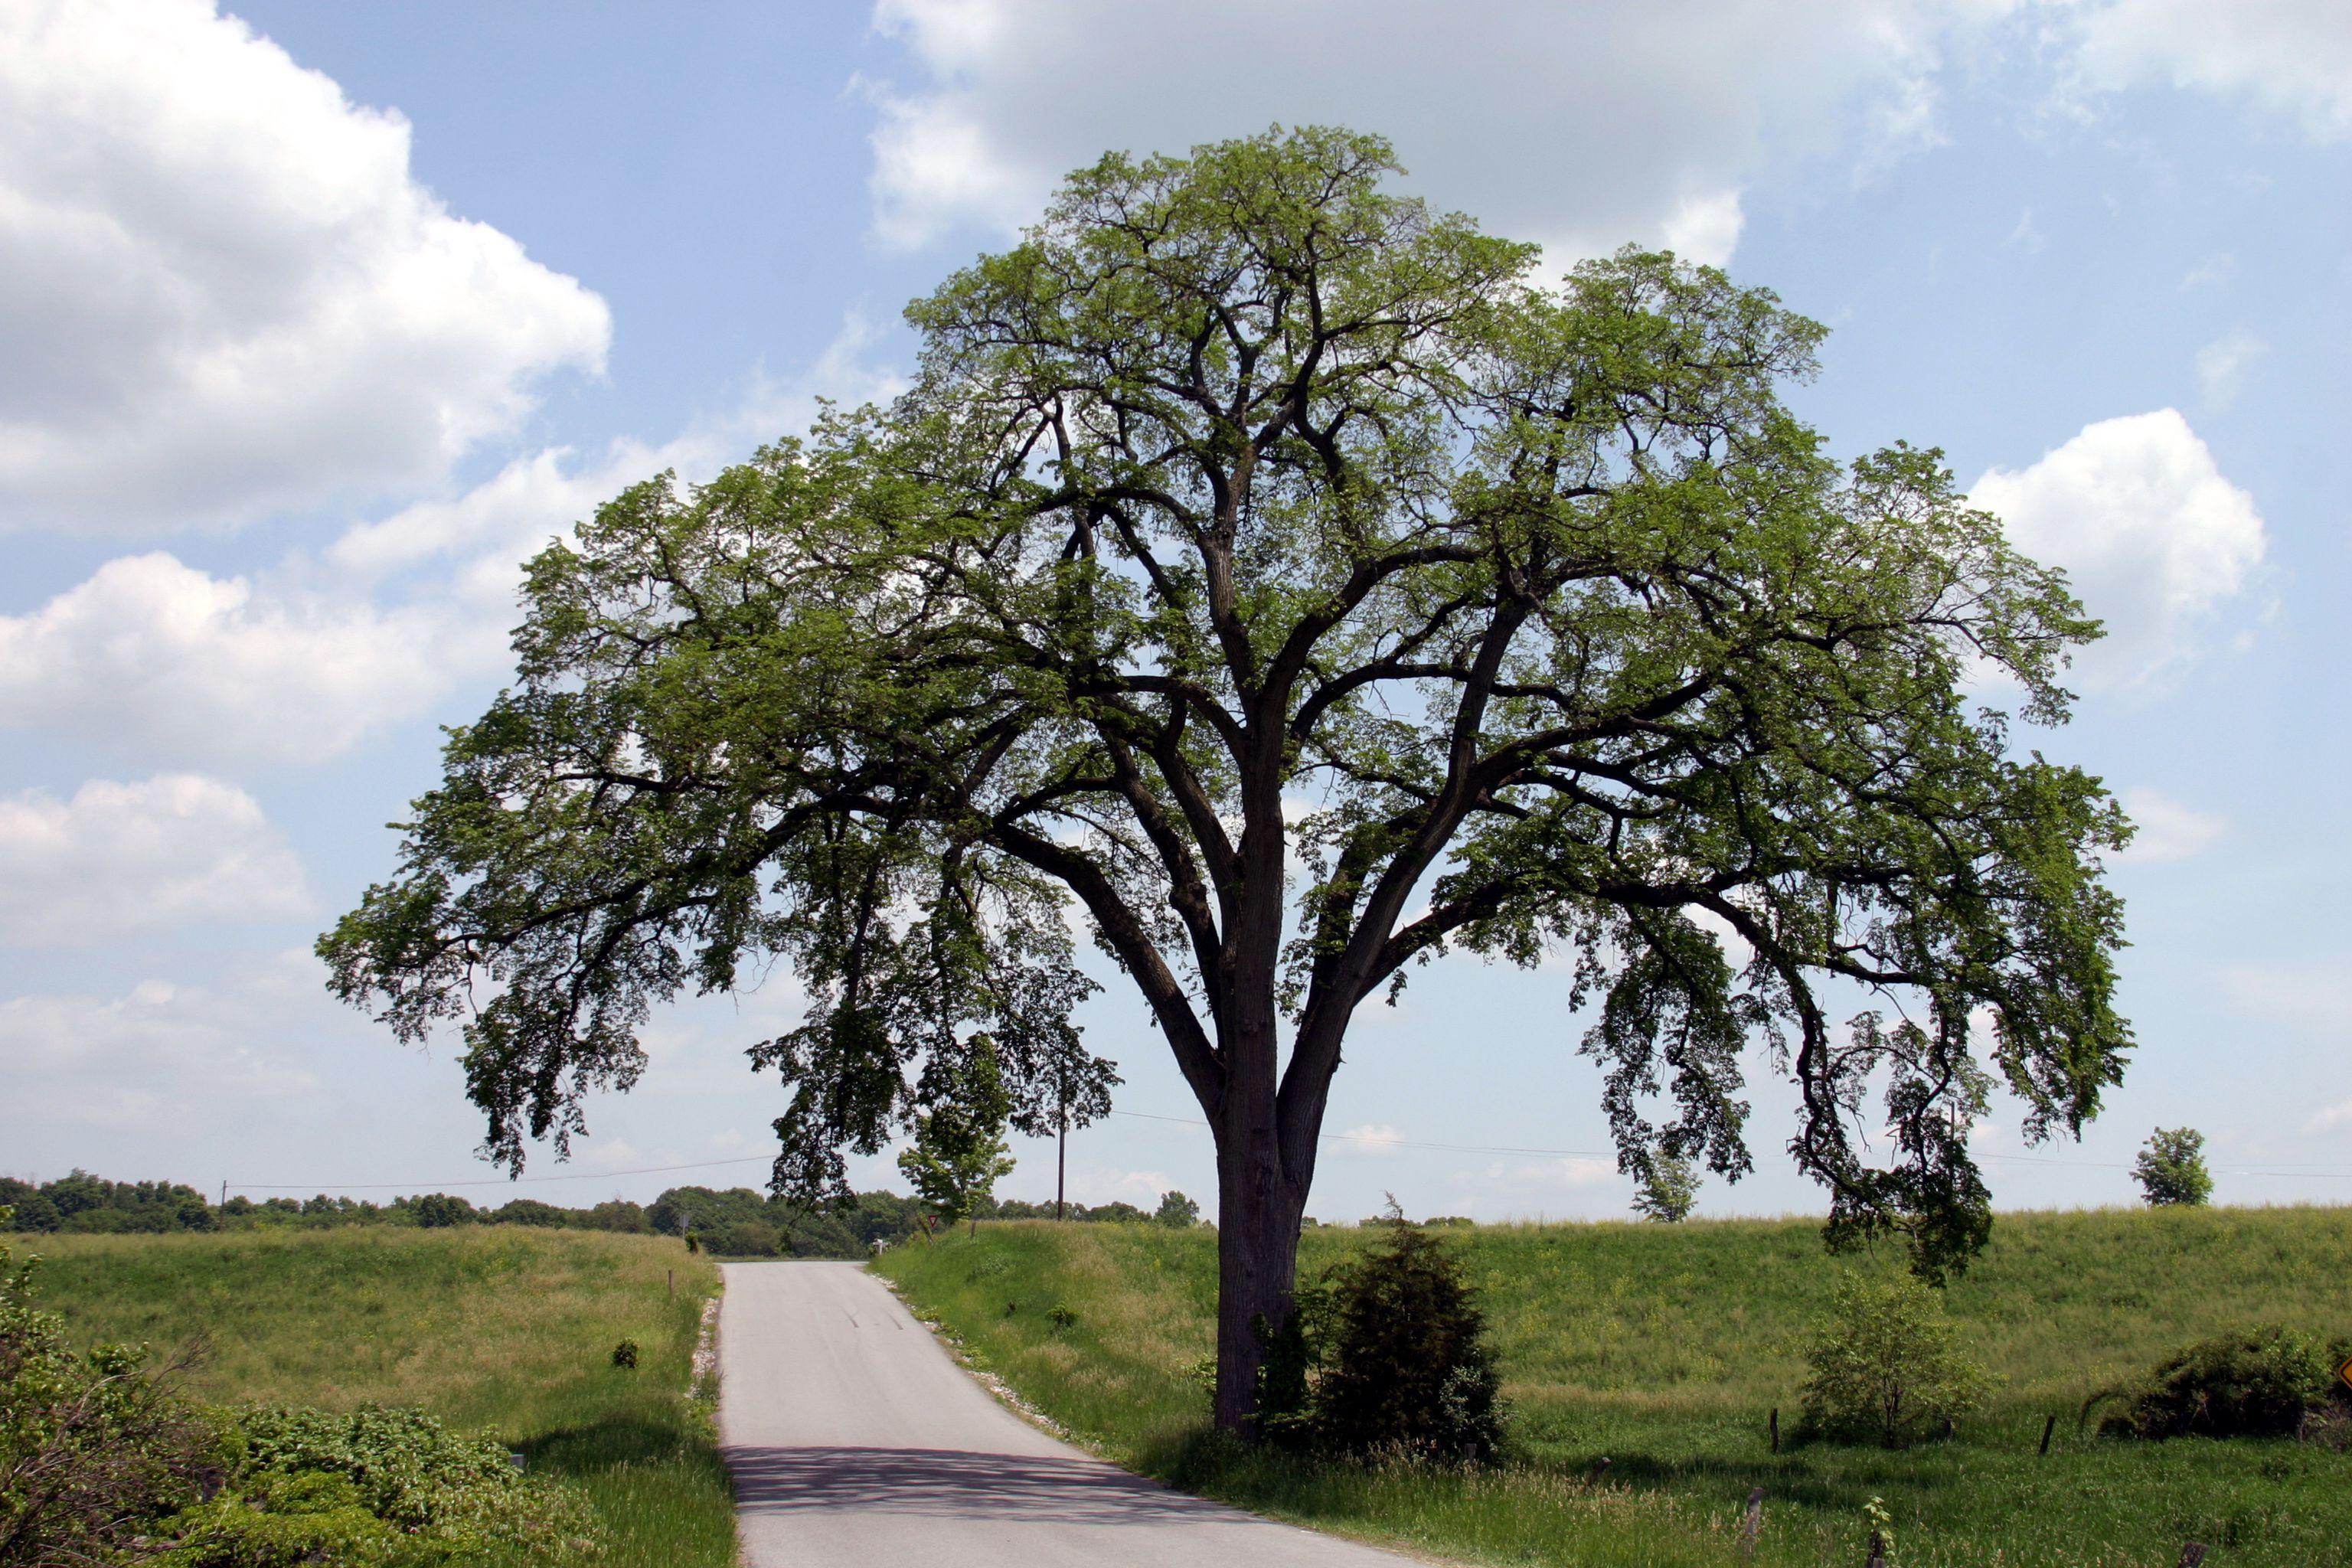 Elm tree alongside a country road